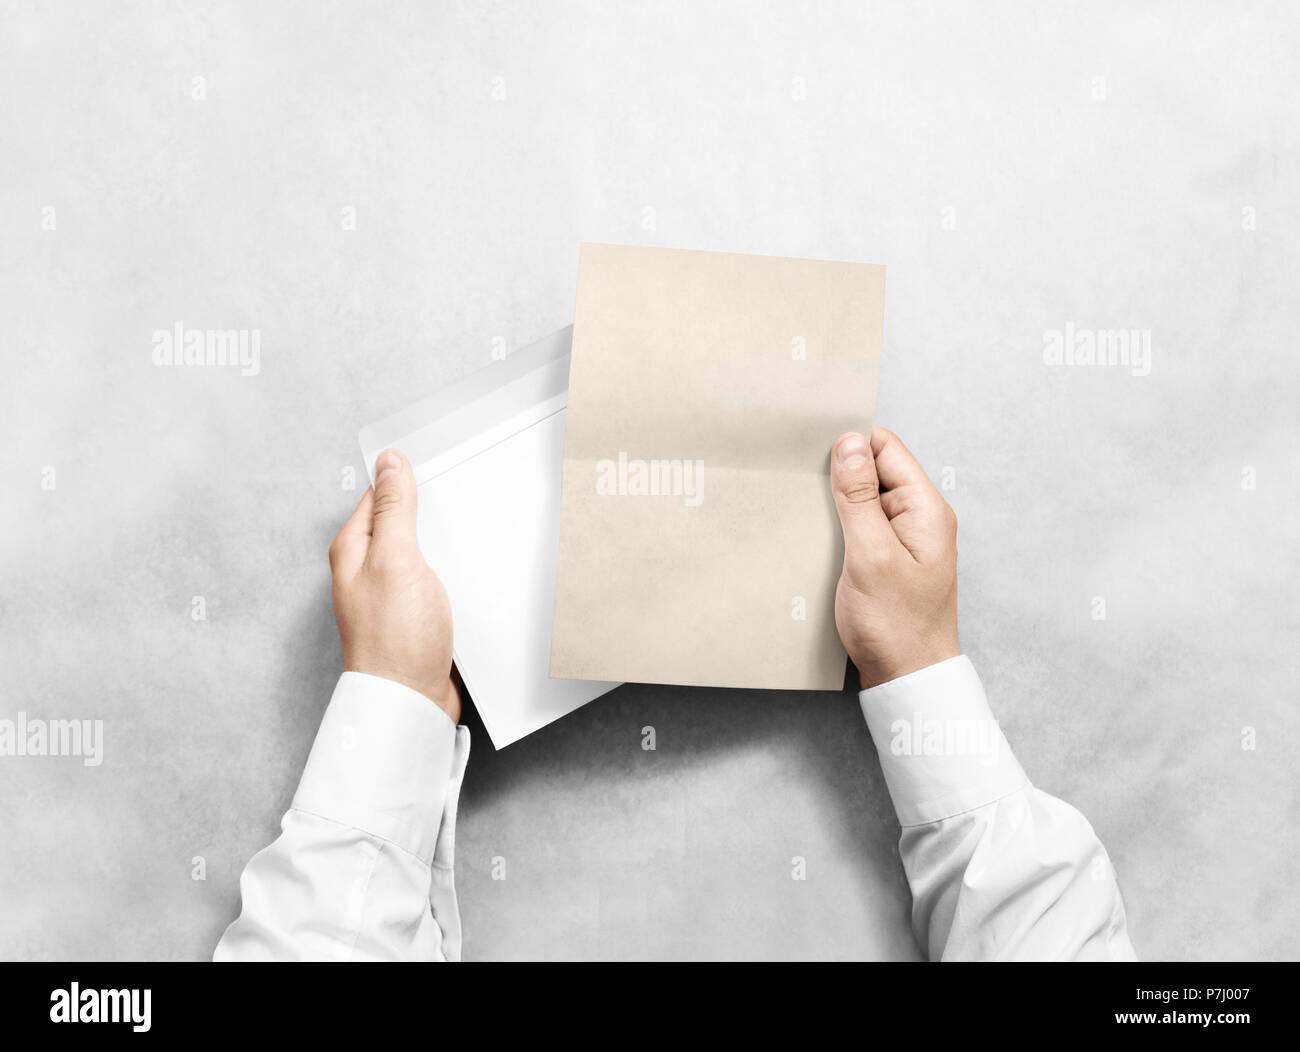 Brochure Template Stockfotos & Brochure Template Bilder - Alamy